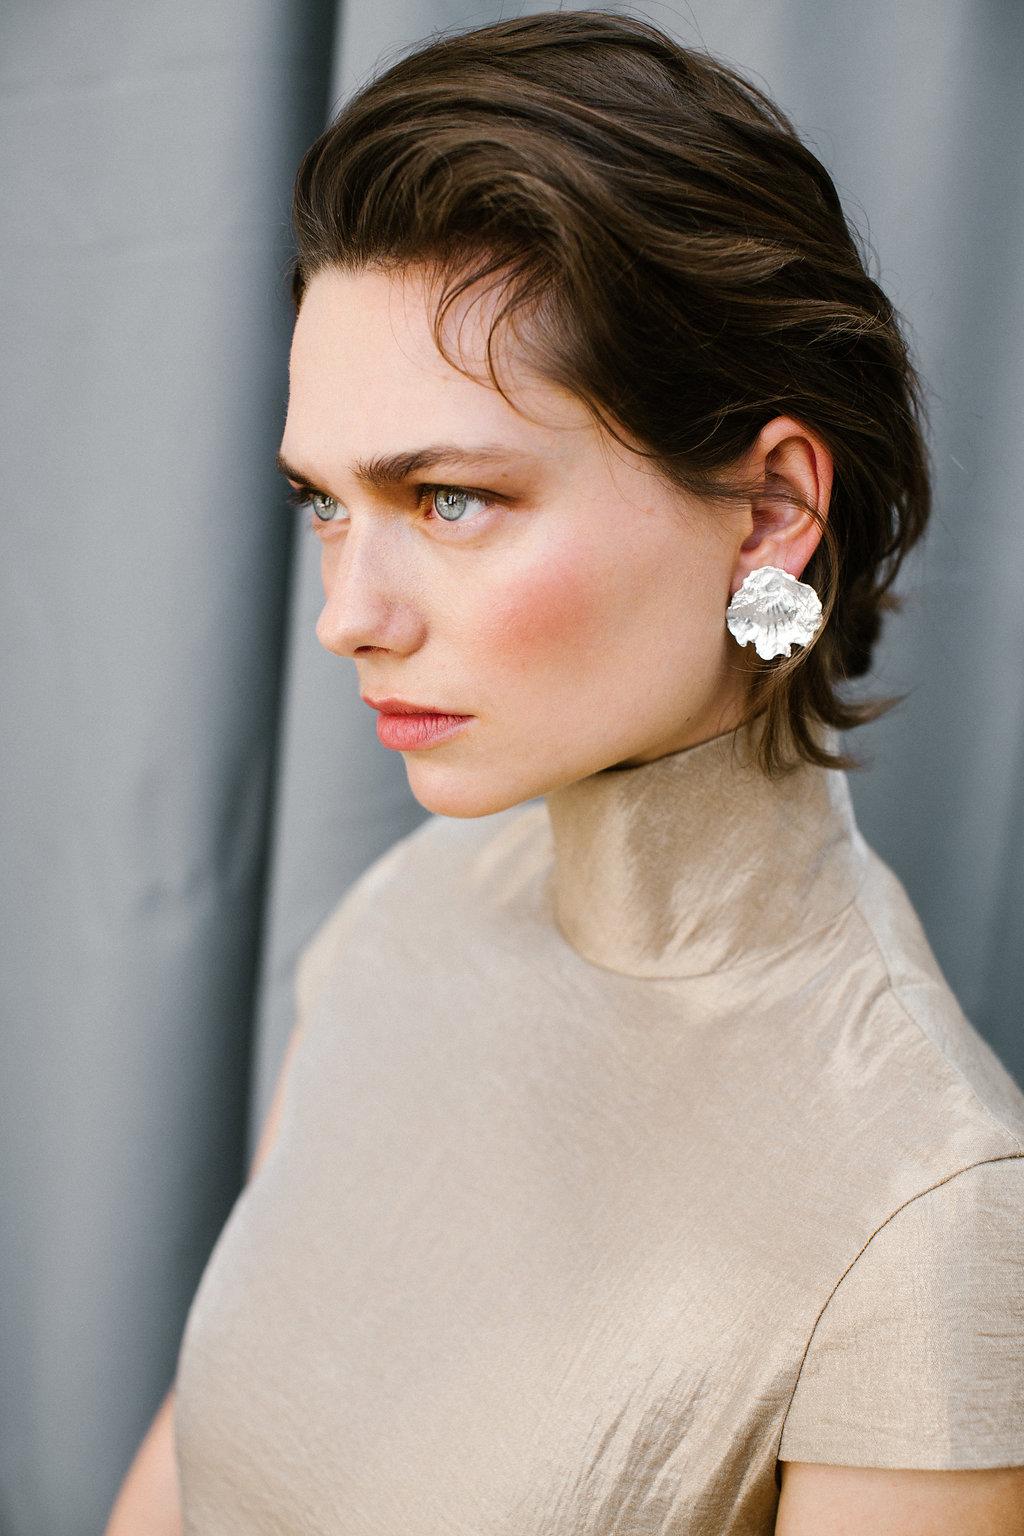 The Cardea earring handmade Sterling Silver earrings by Naturae Design.